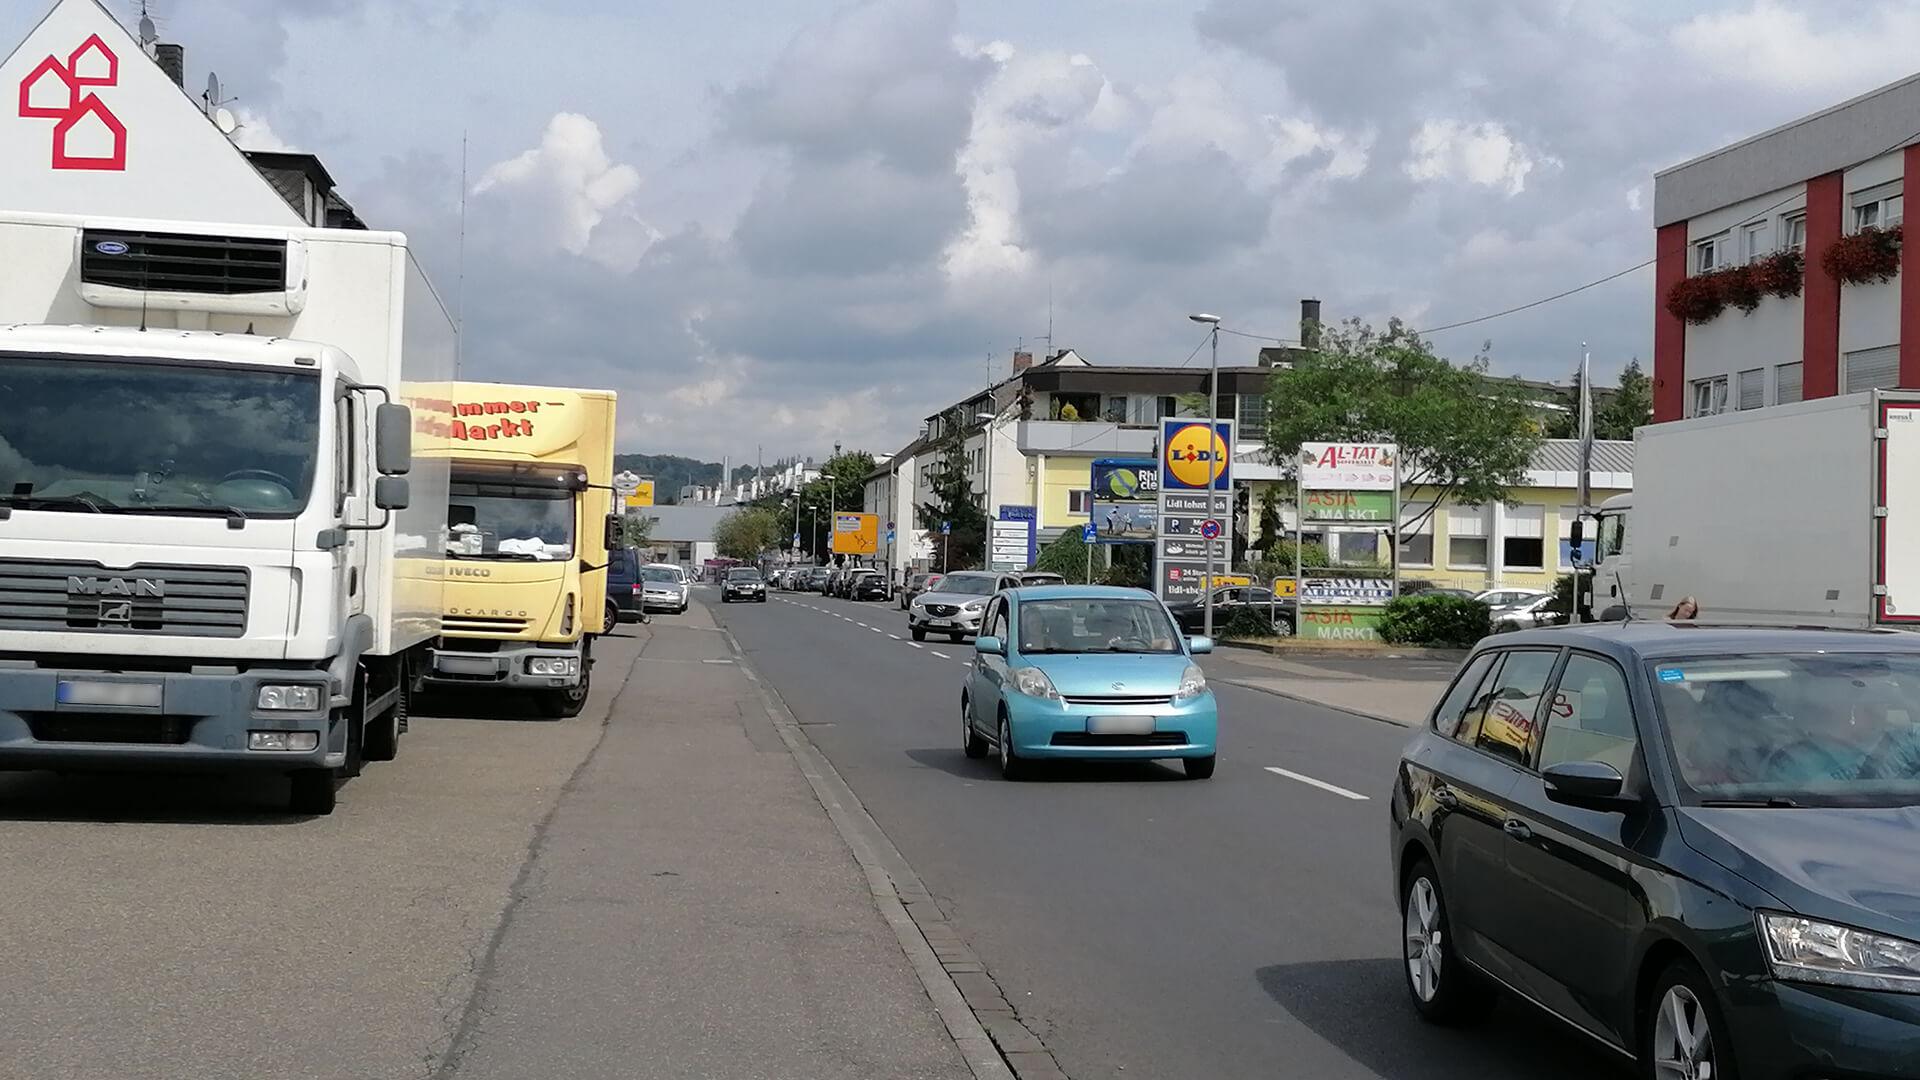 koblenz-luetzel-projekte-handlungsfelder-2-2-1c